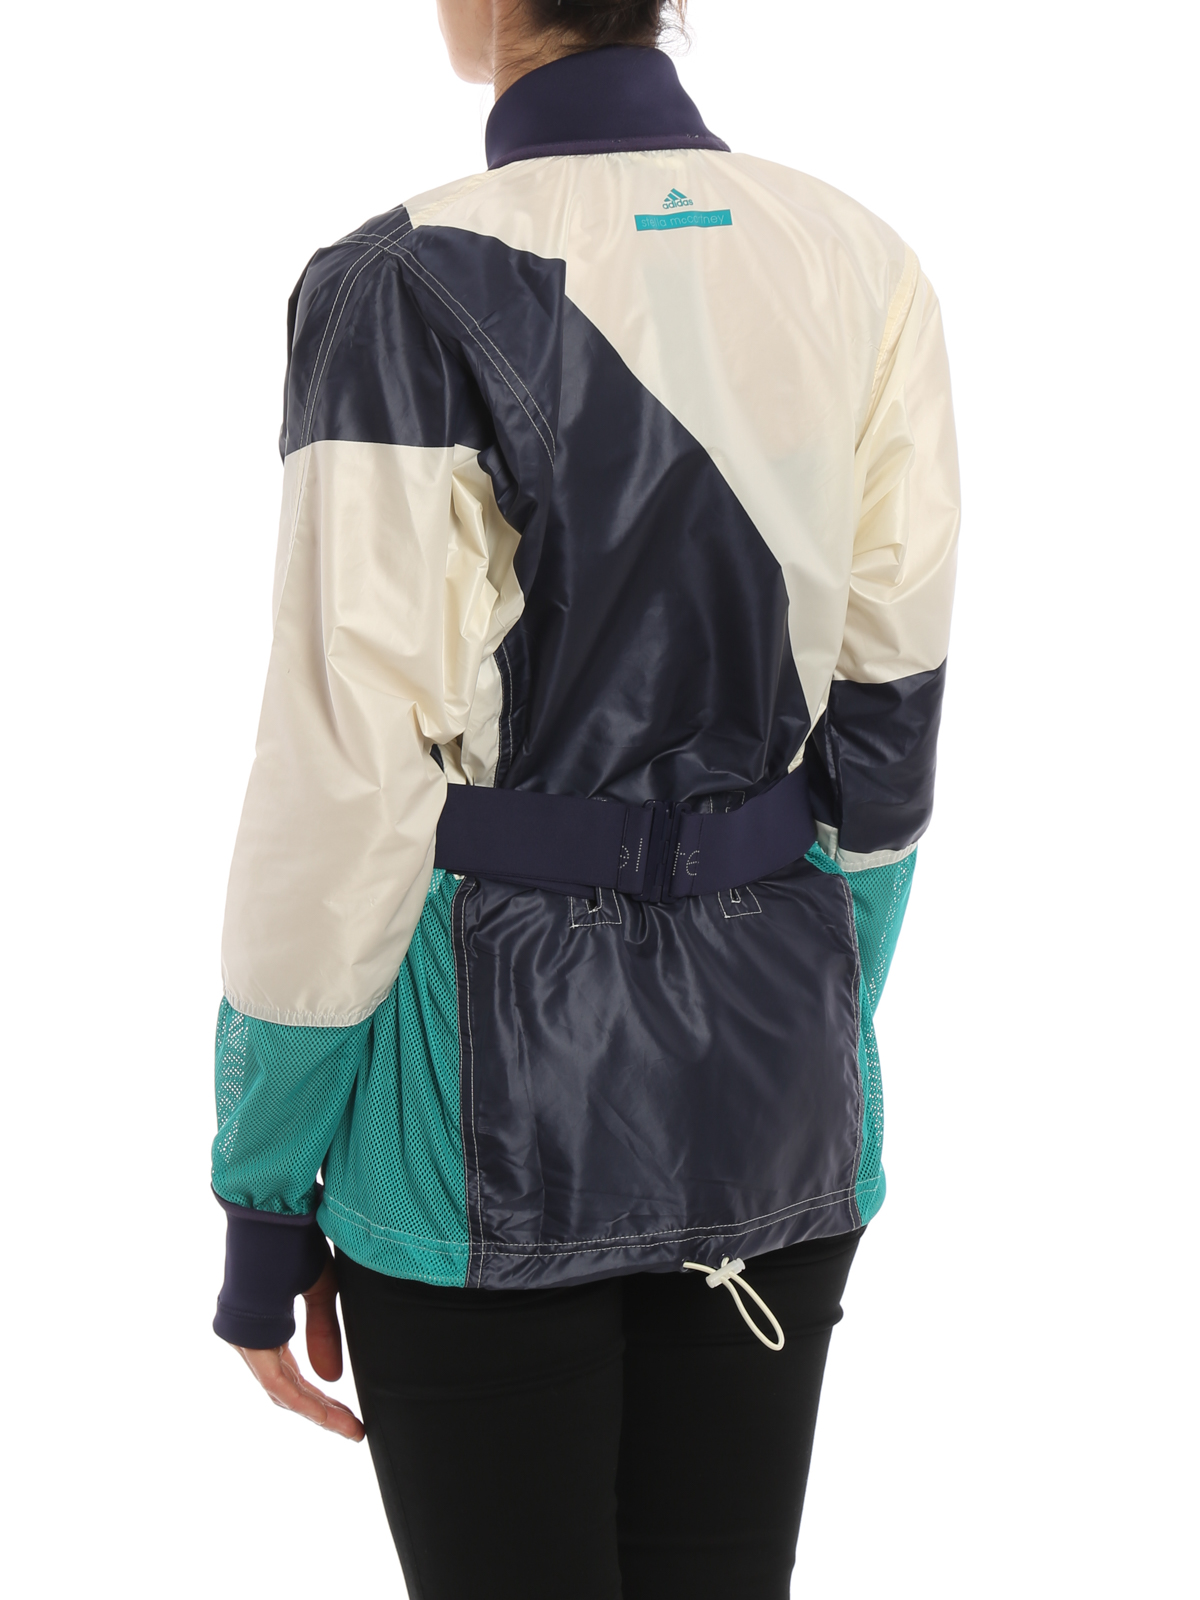 8bb3ea0964 iKRIX ADIDAS BY STELLA MCCARTNEY  casual jackets - Run Kite running jacket